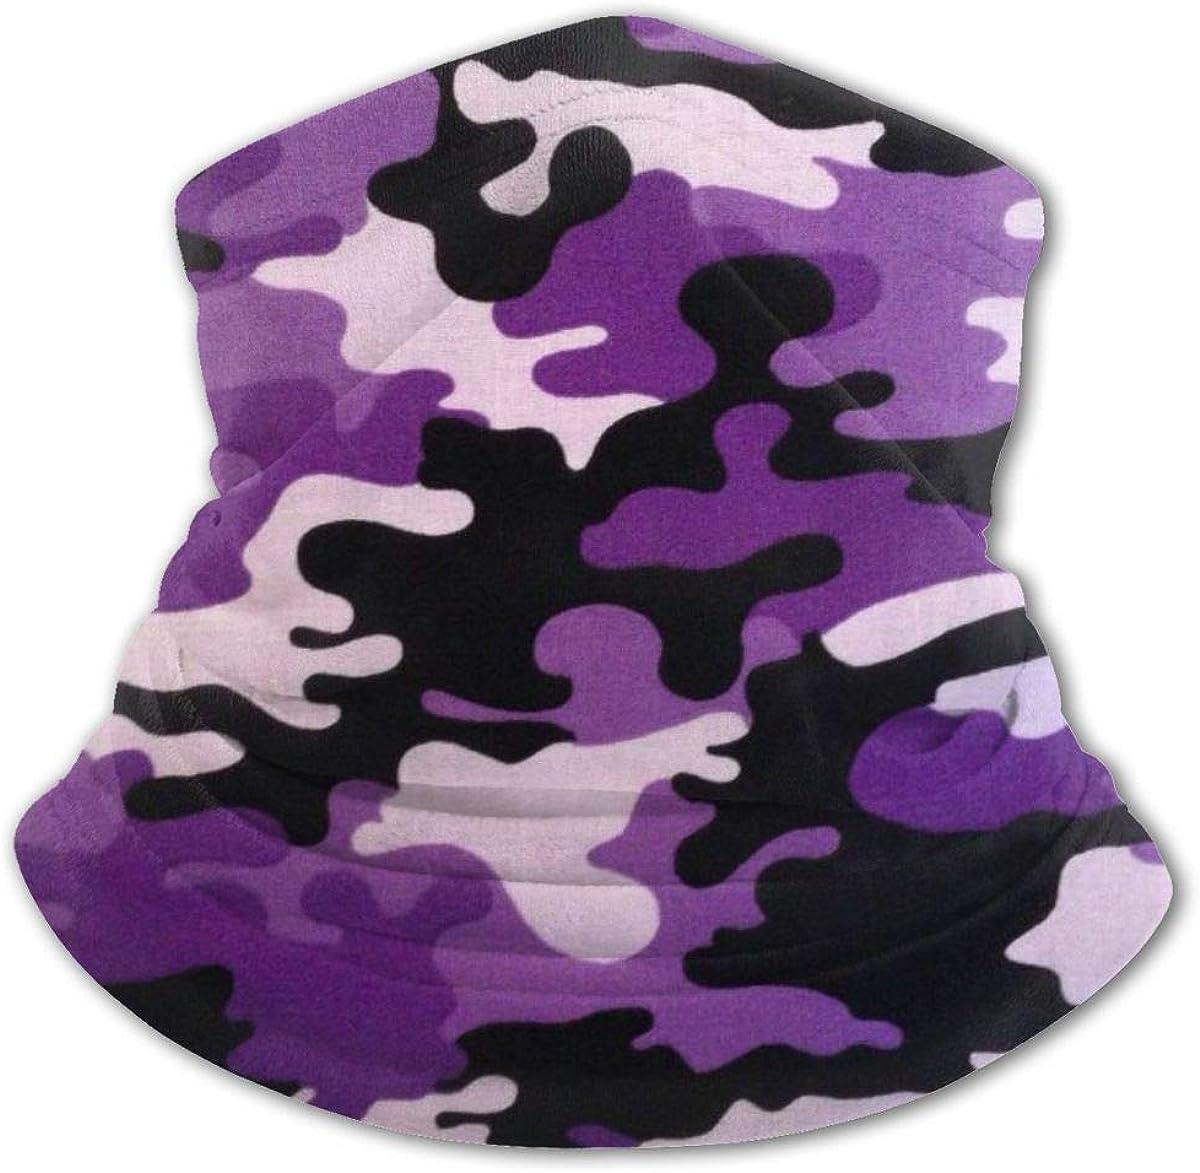 Purple Camouflage Headwear For Girls And Boys, Head Wrap, Neck Gaiter, Headband, Tenn Fishing Mask, Magic Scarf, Tube Mask, Face Bandana Mask For Camping Running Cycling